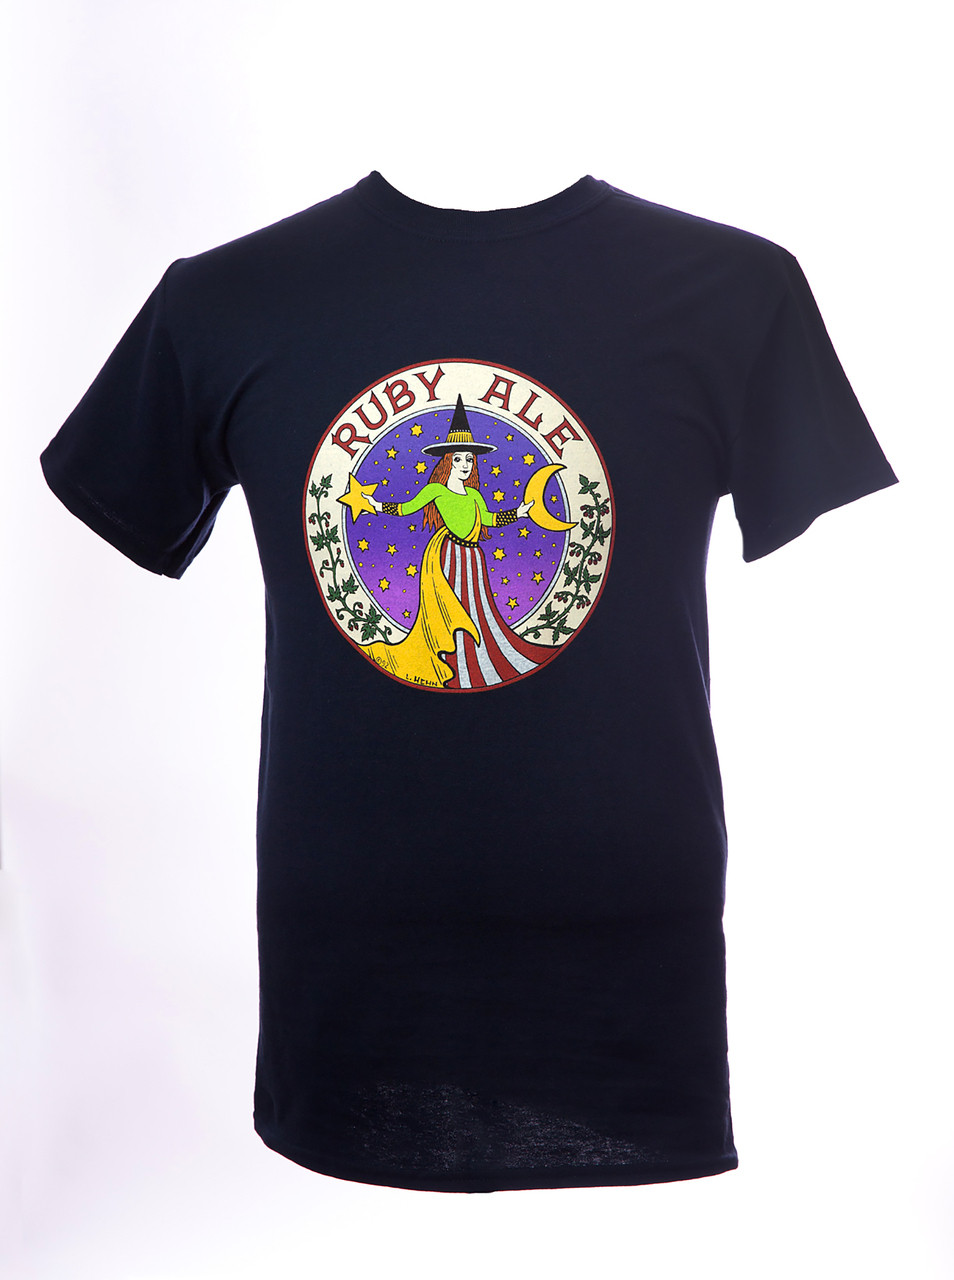 Ruby Ale T-Shirt - McMenamins Online Shop 2905f6144